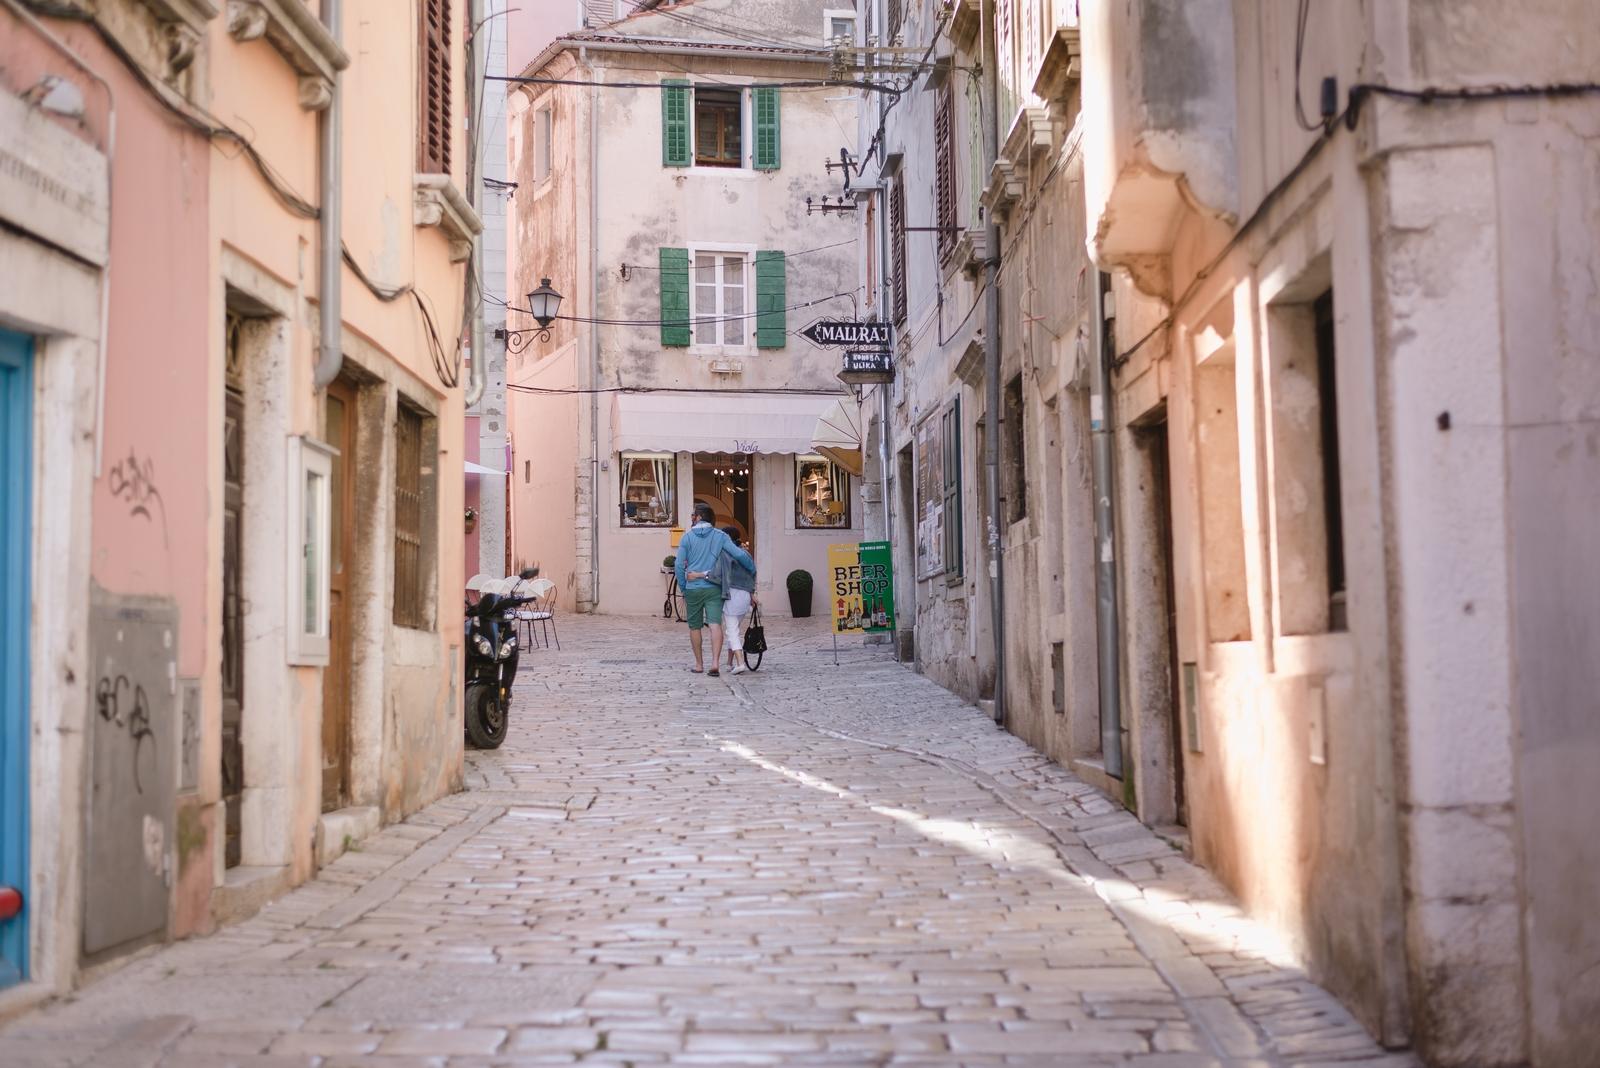 Cobblestone street in Rovinj Old Town, Istria, Croatia - from travel blog http://Epepa.eu